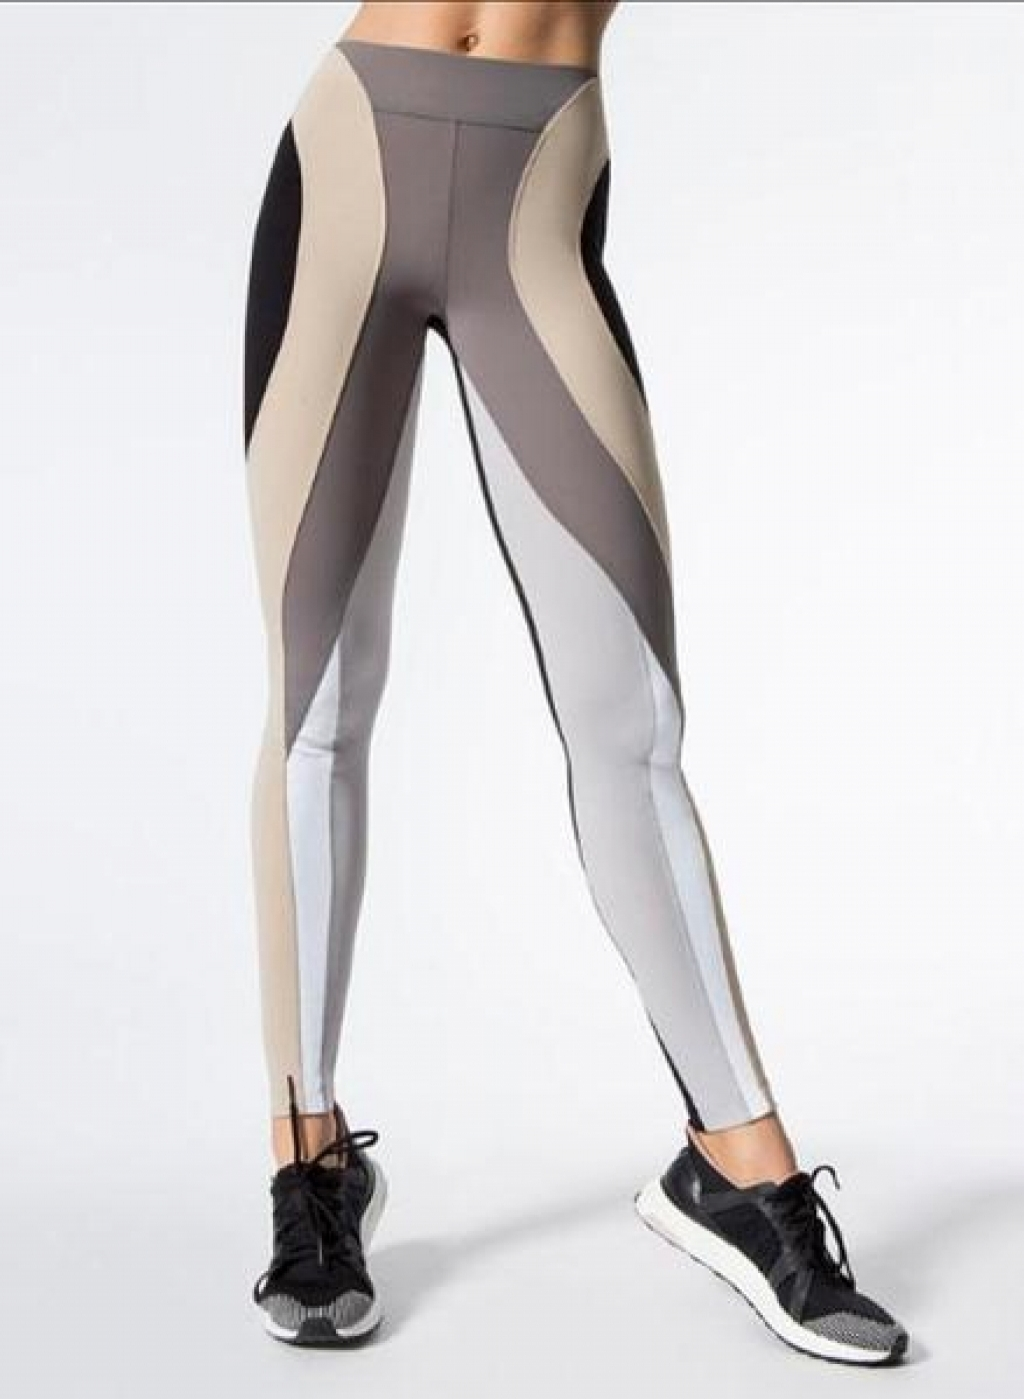 15429843670_liz-m-leggings-kimi-legging-1423132426280_grande.jpg